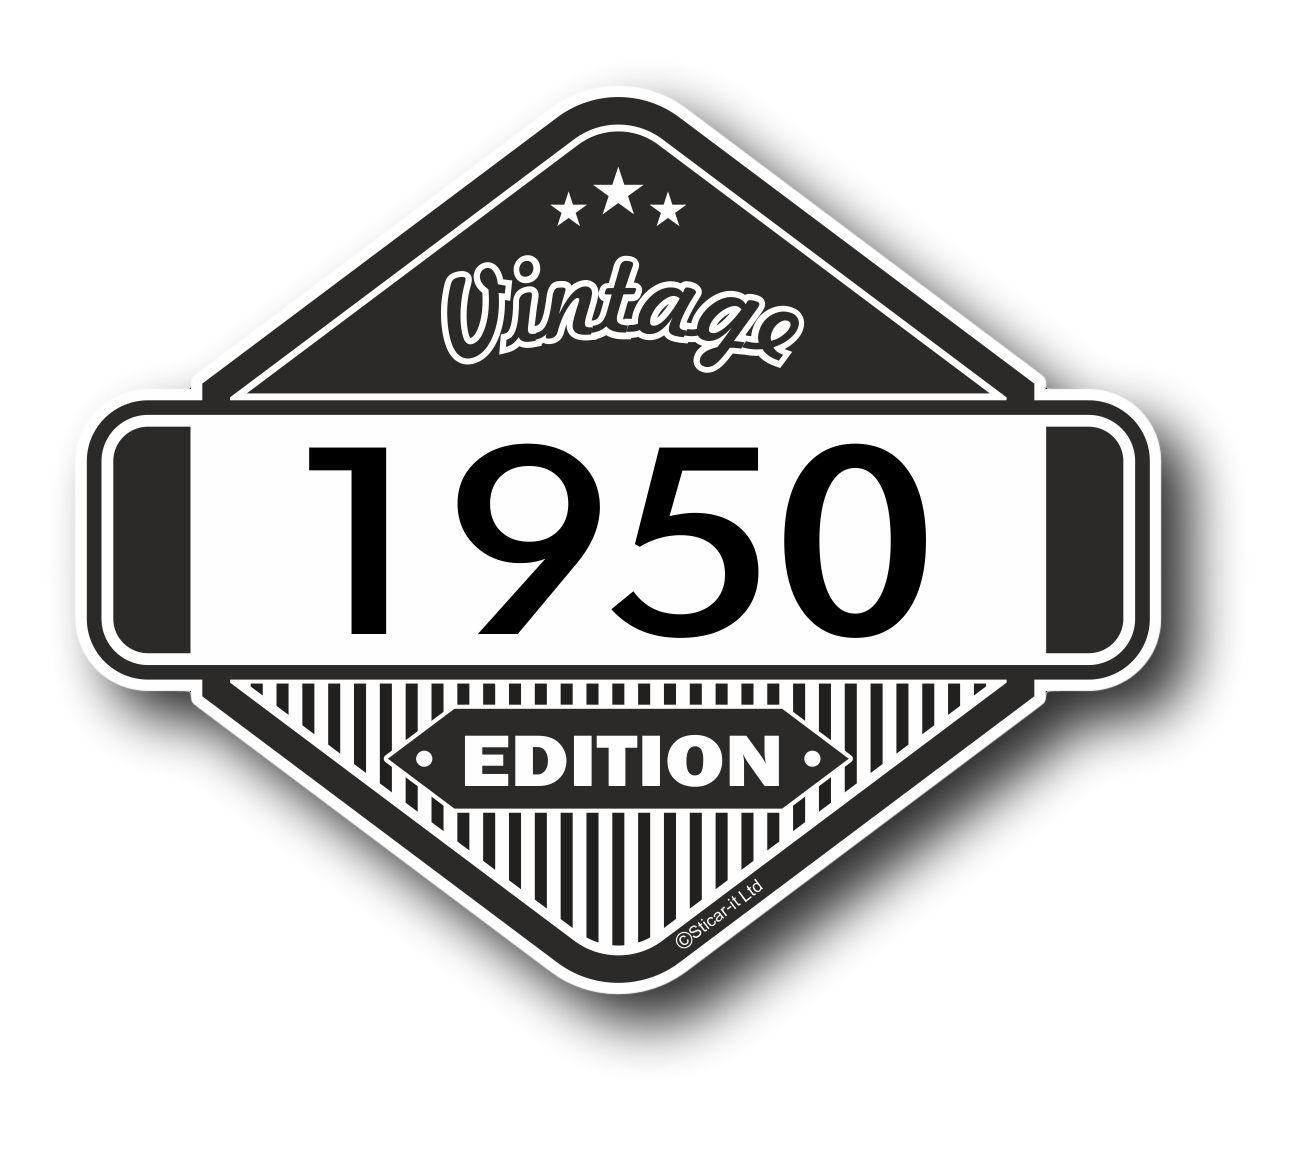 vintage edition 1950 classic retro cafe racer design external